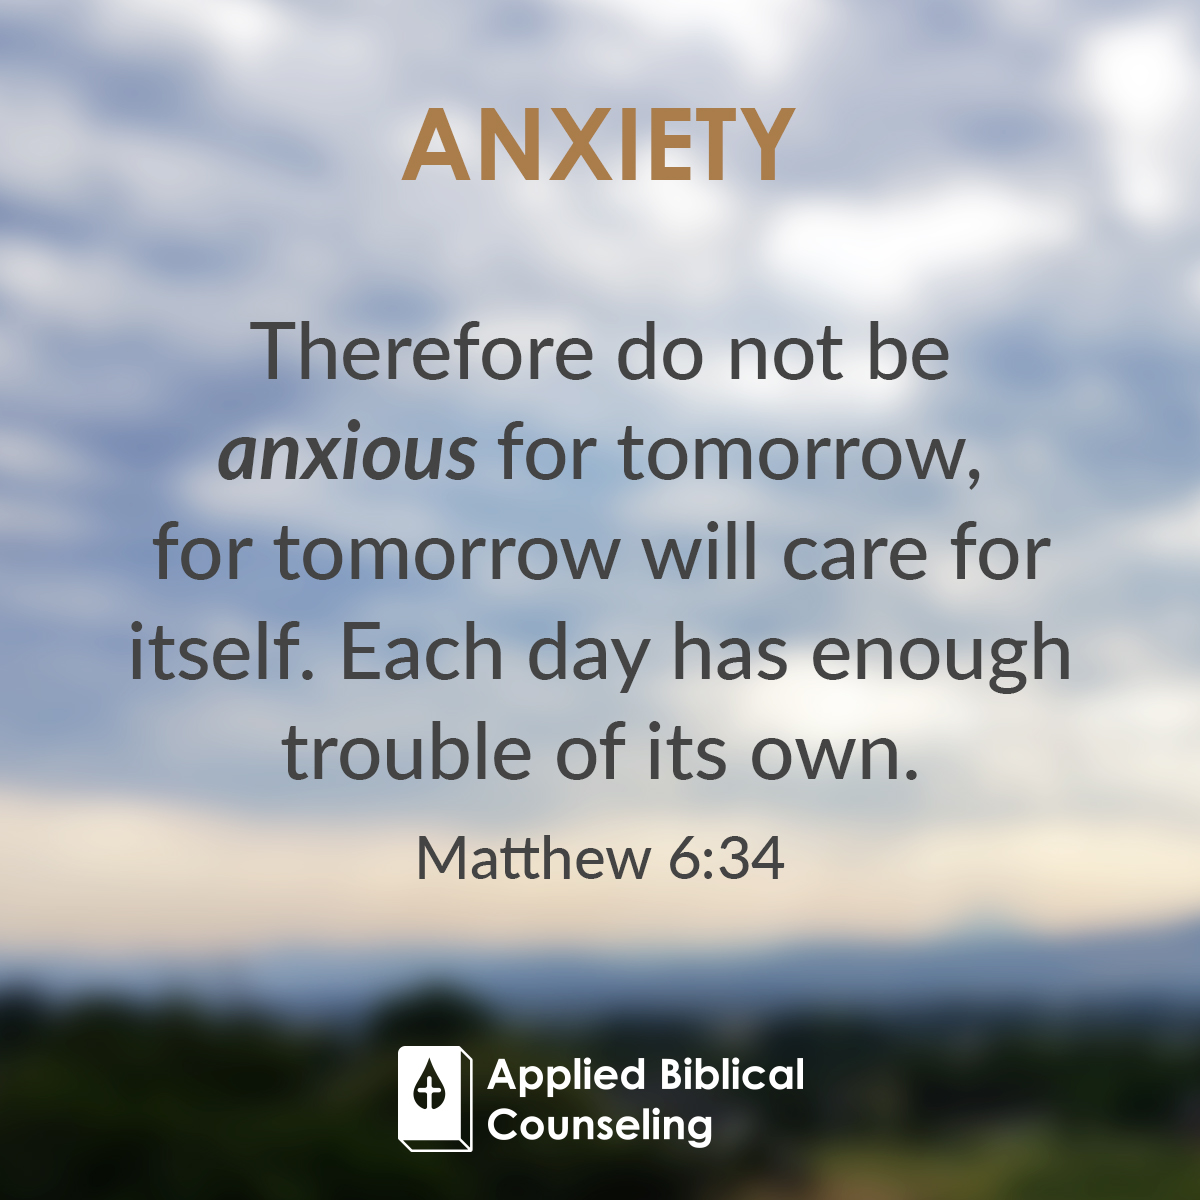 ABC_Facebook-w8-anxiety-1